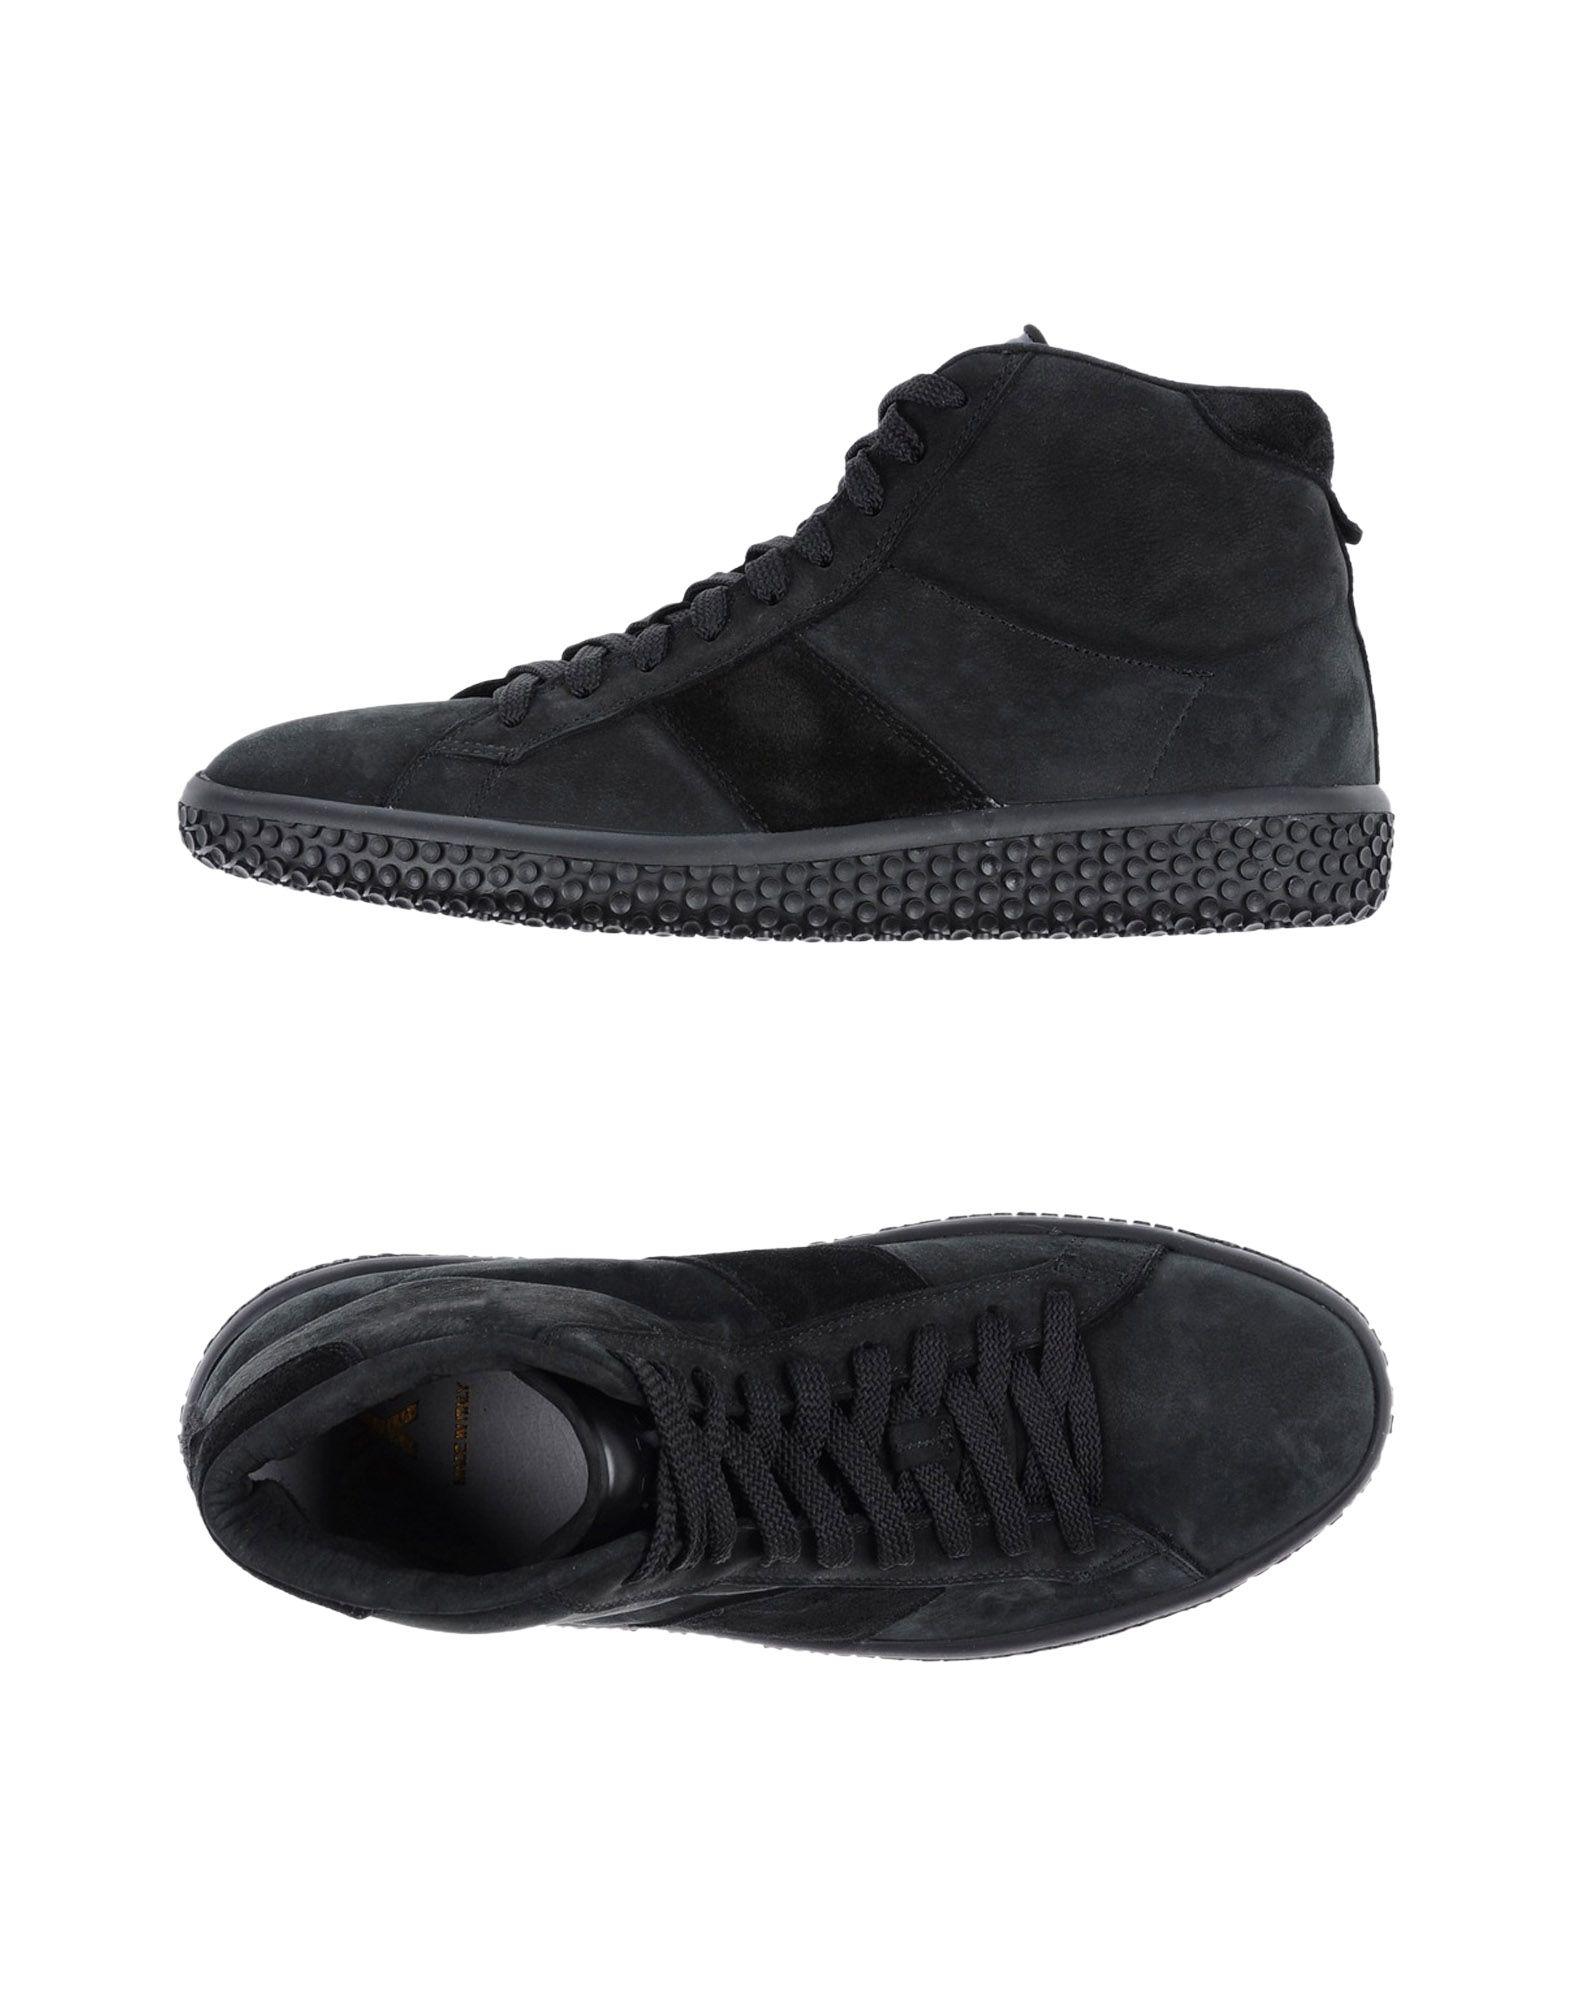 O.X.S. Sneakers Sneakers O.X.S. Herren  11355172LI c795ad